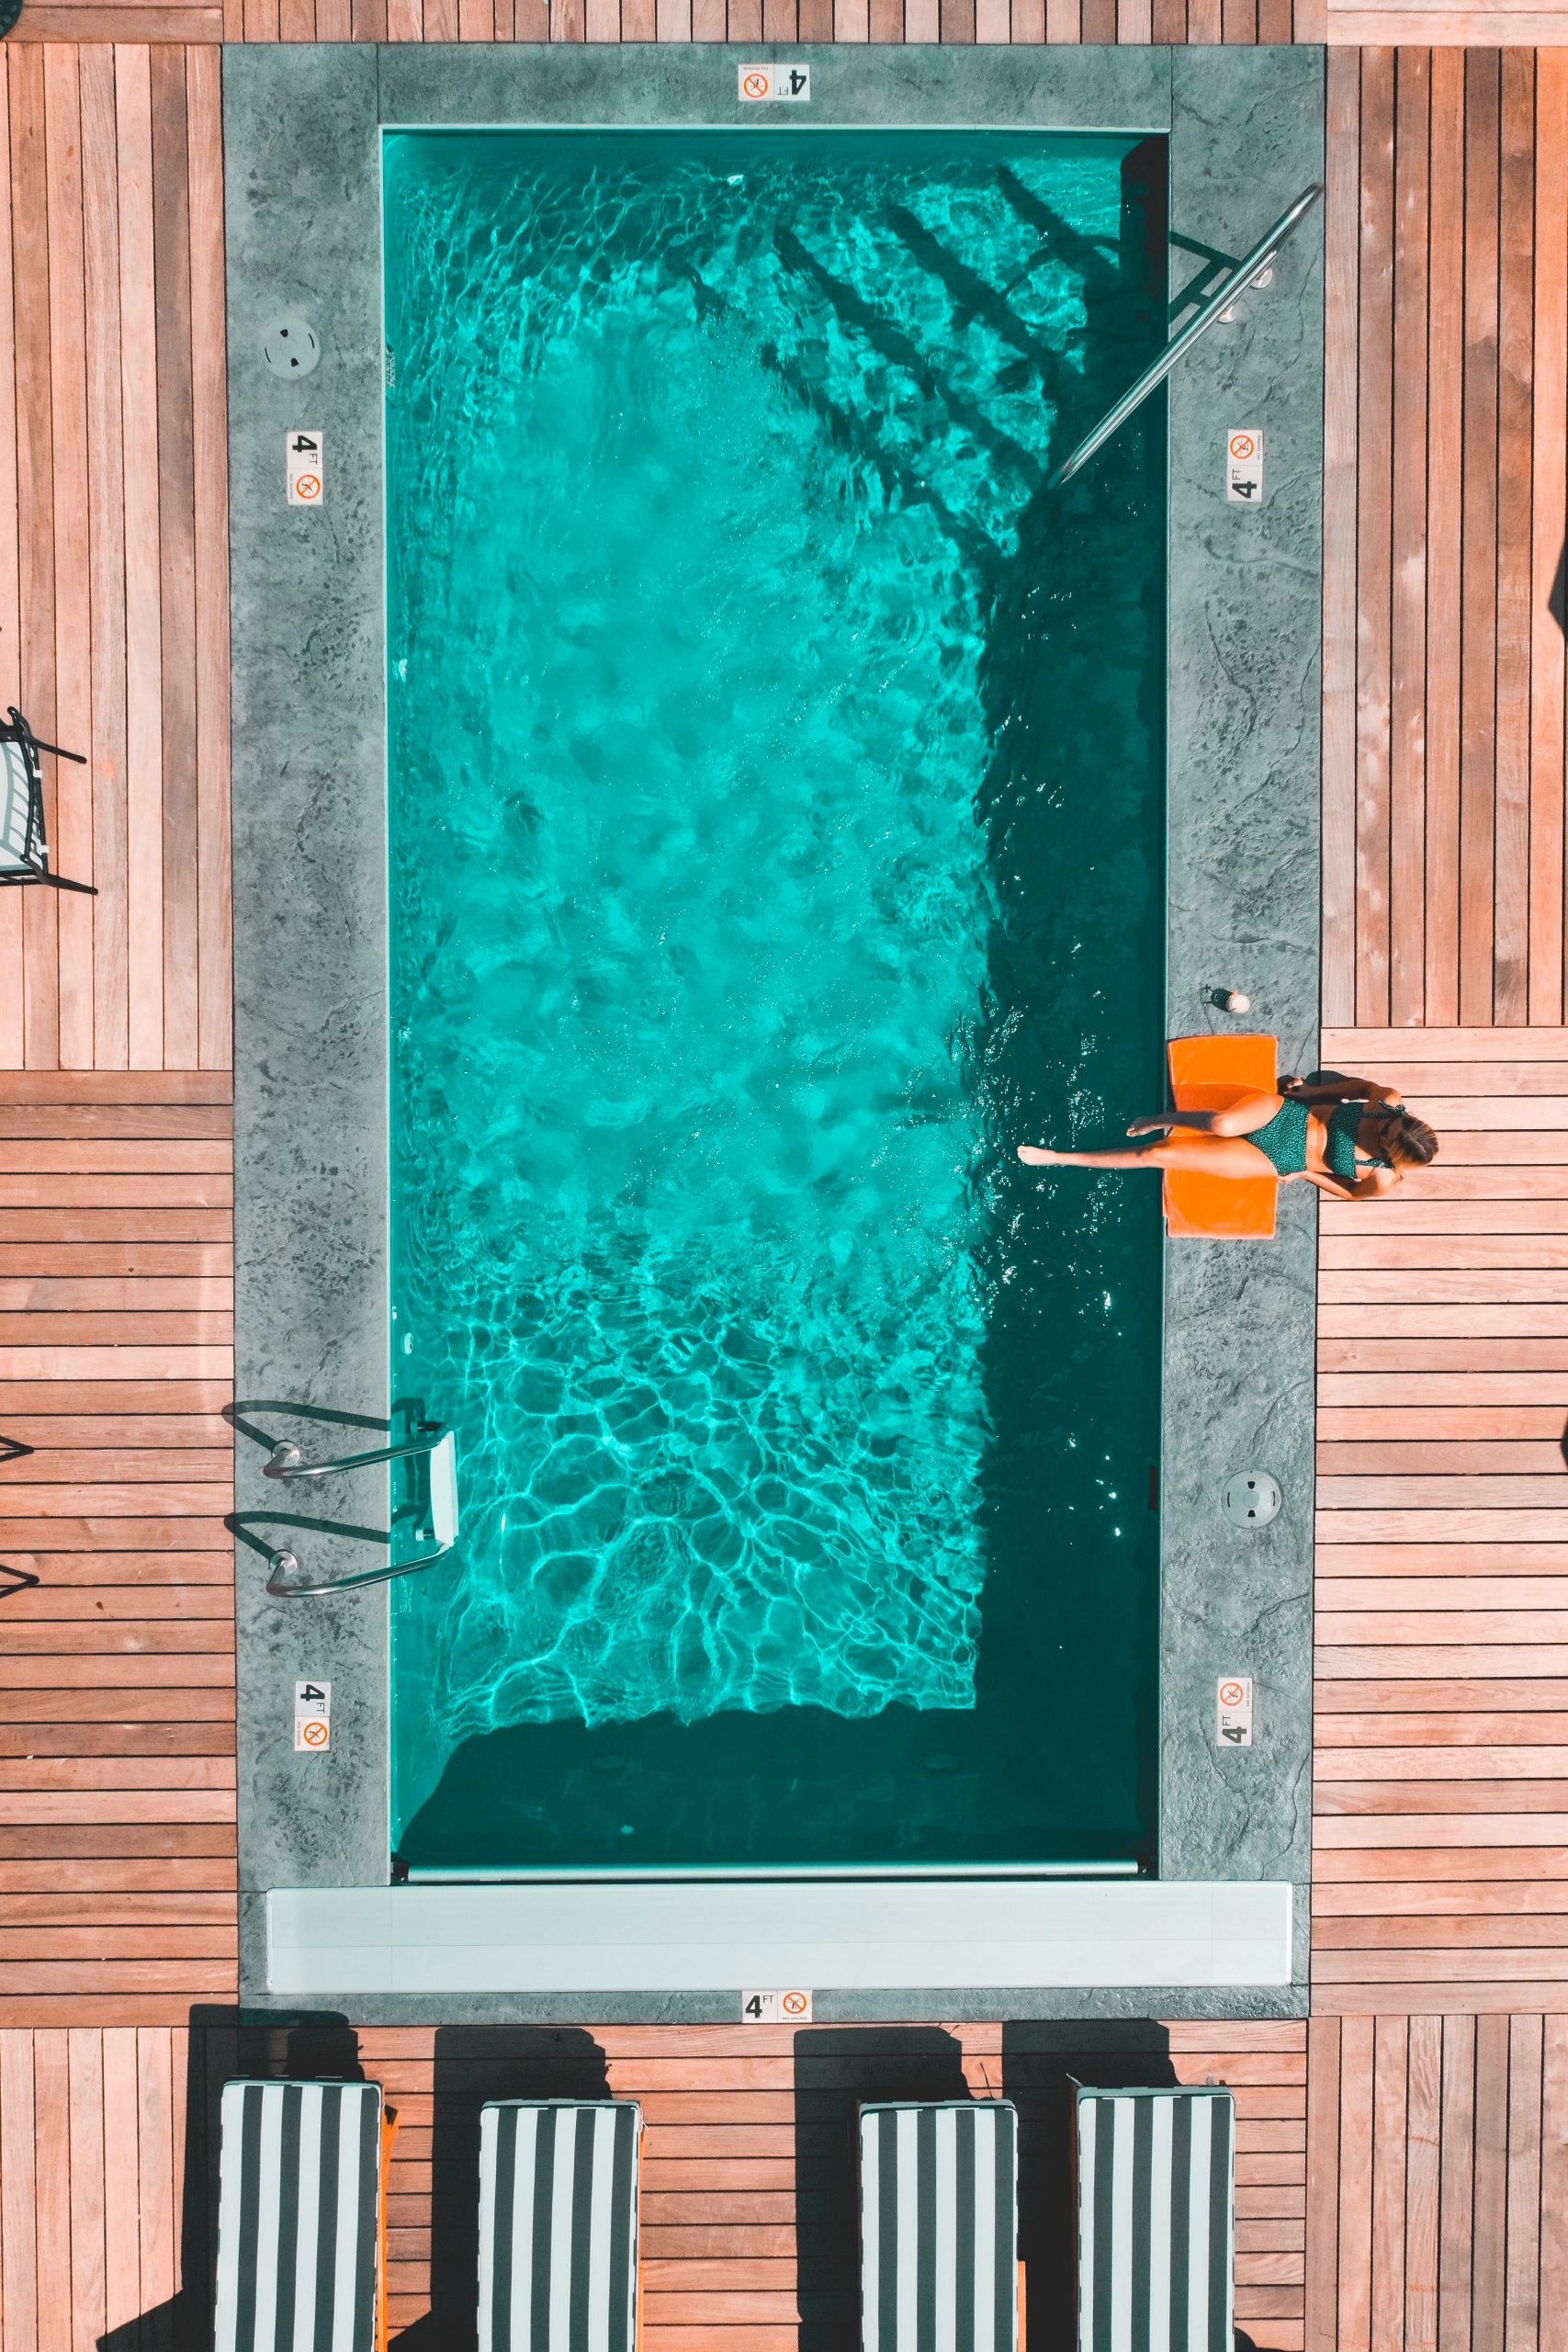 Pool Wasser regelmäßig reinigen wie